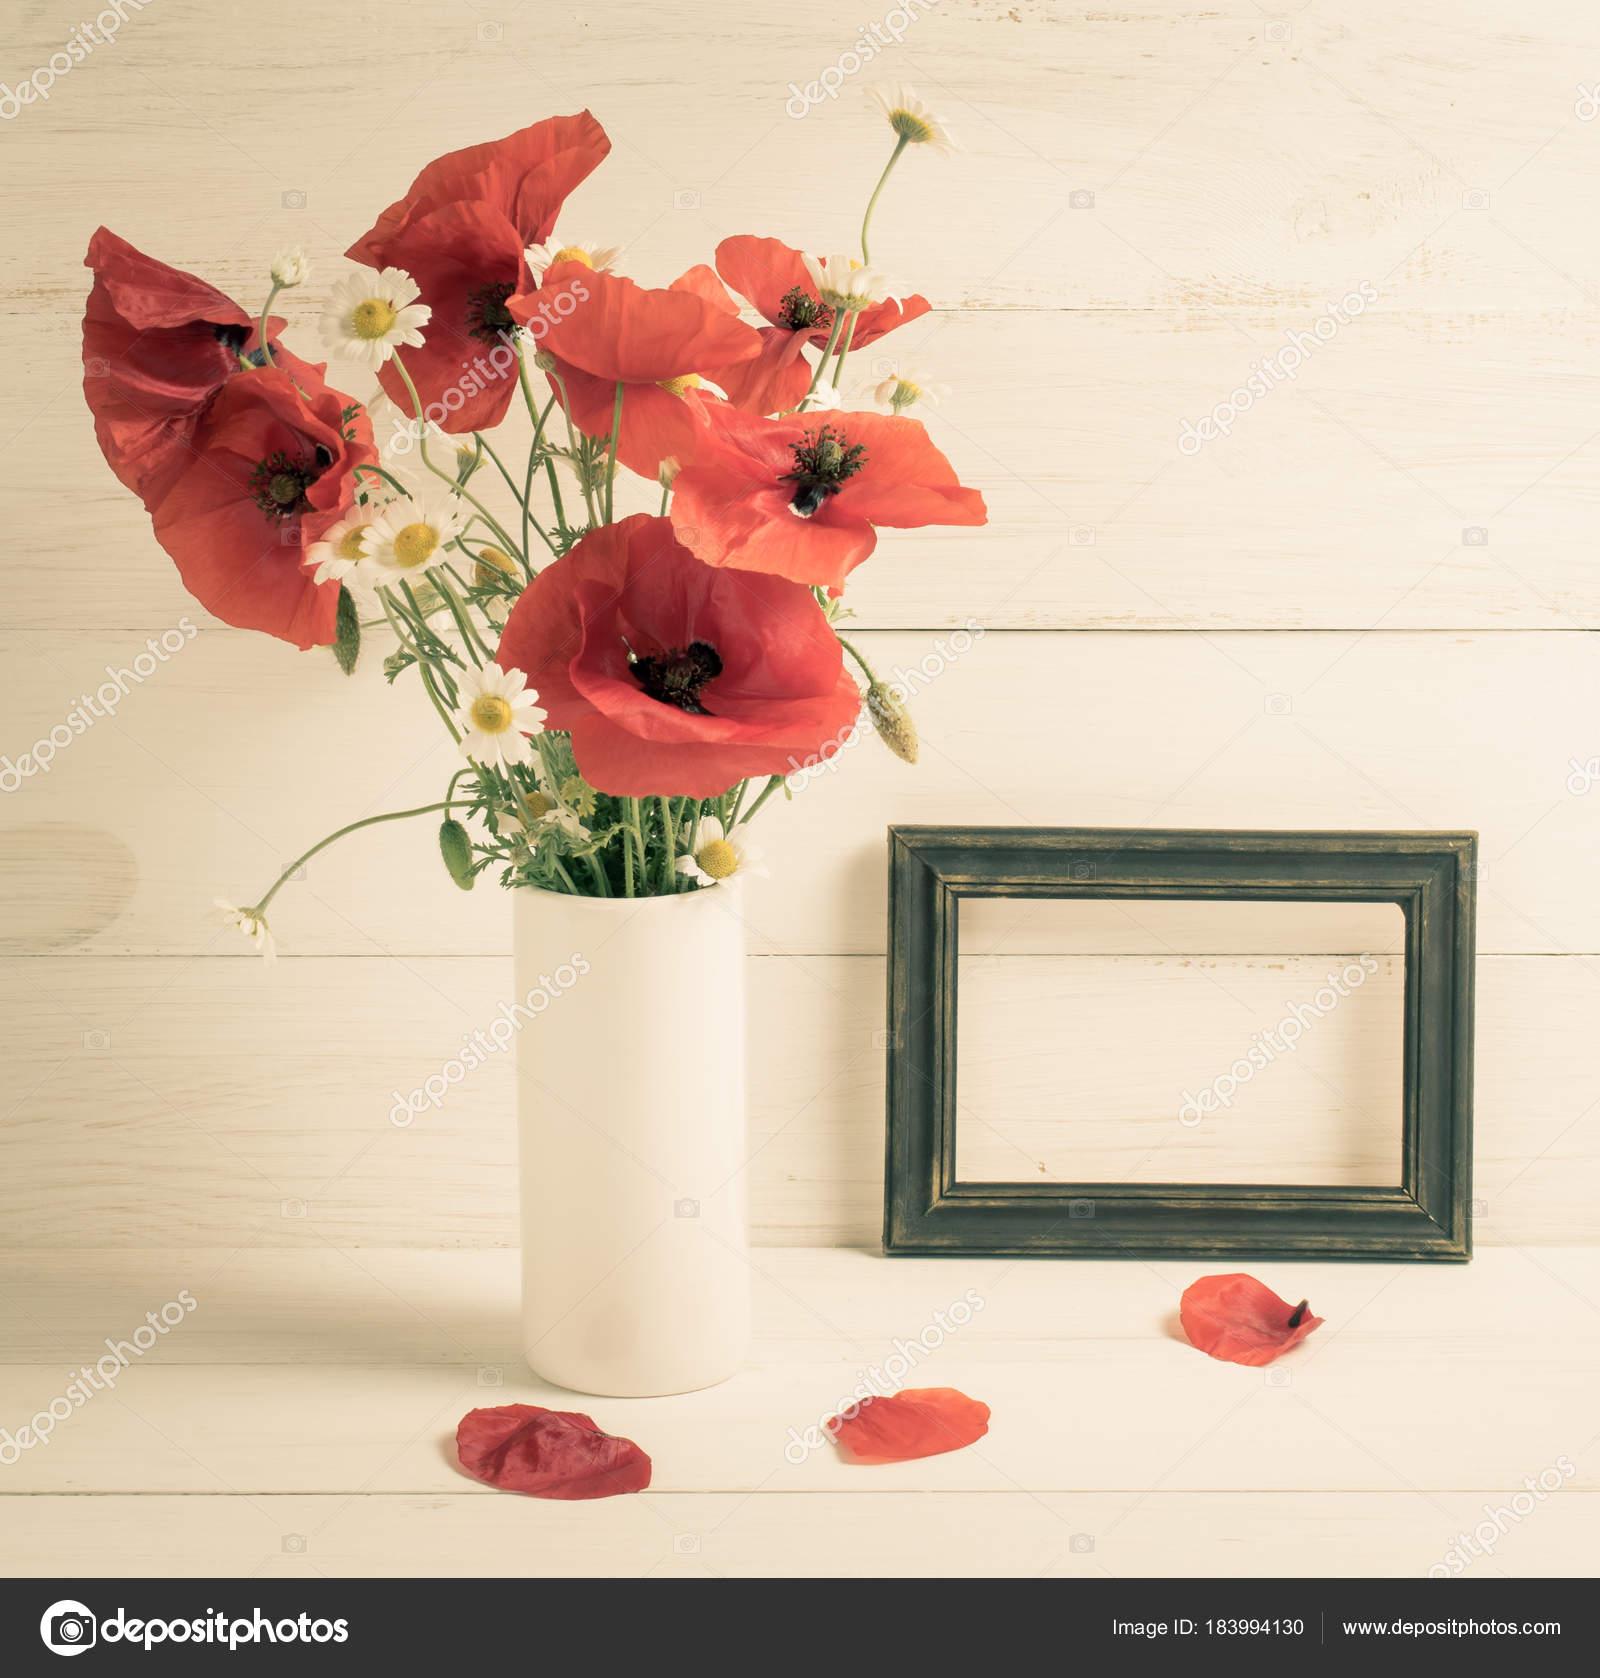 Mohnblumen in Vase und Foto-frame — Stockfoto © Julia_Arda #183994130